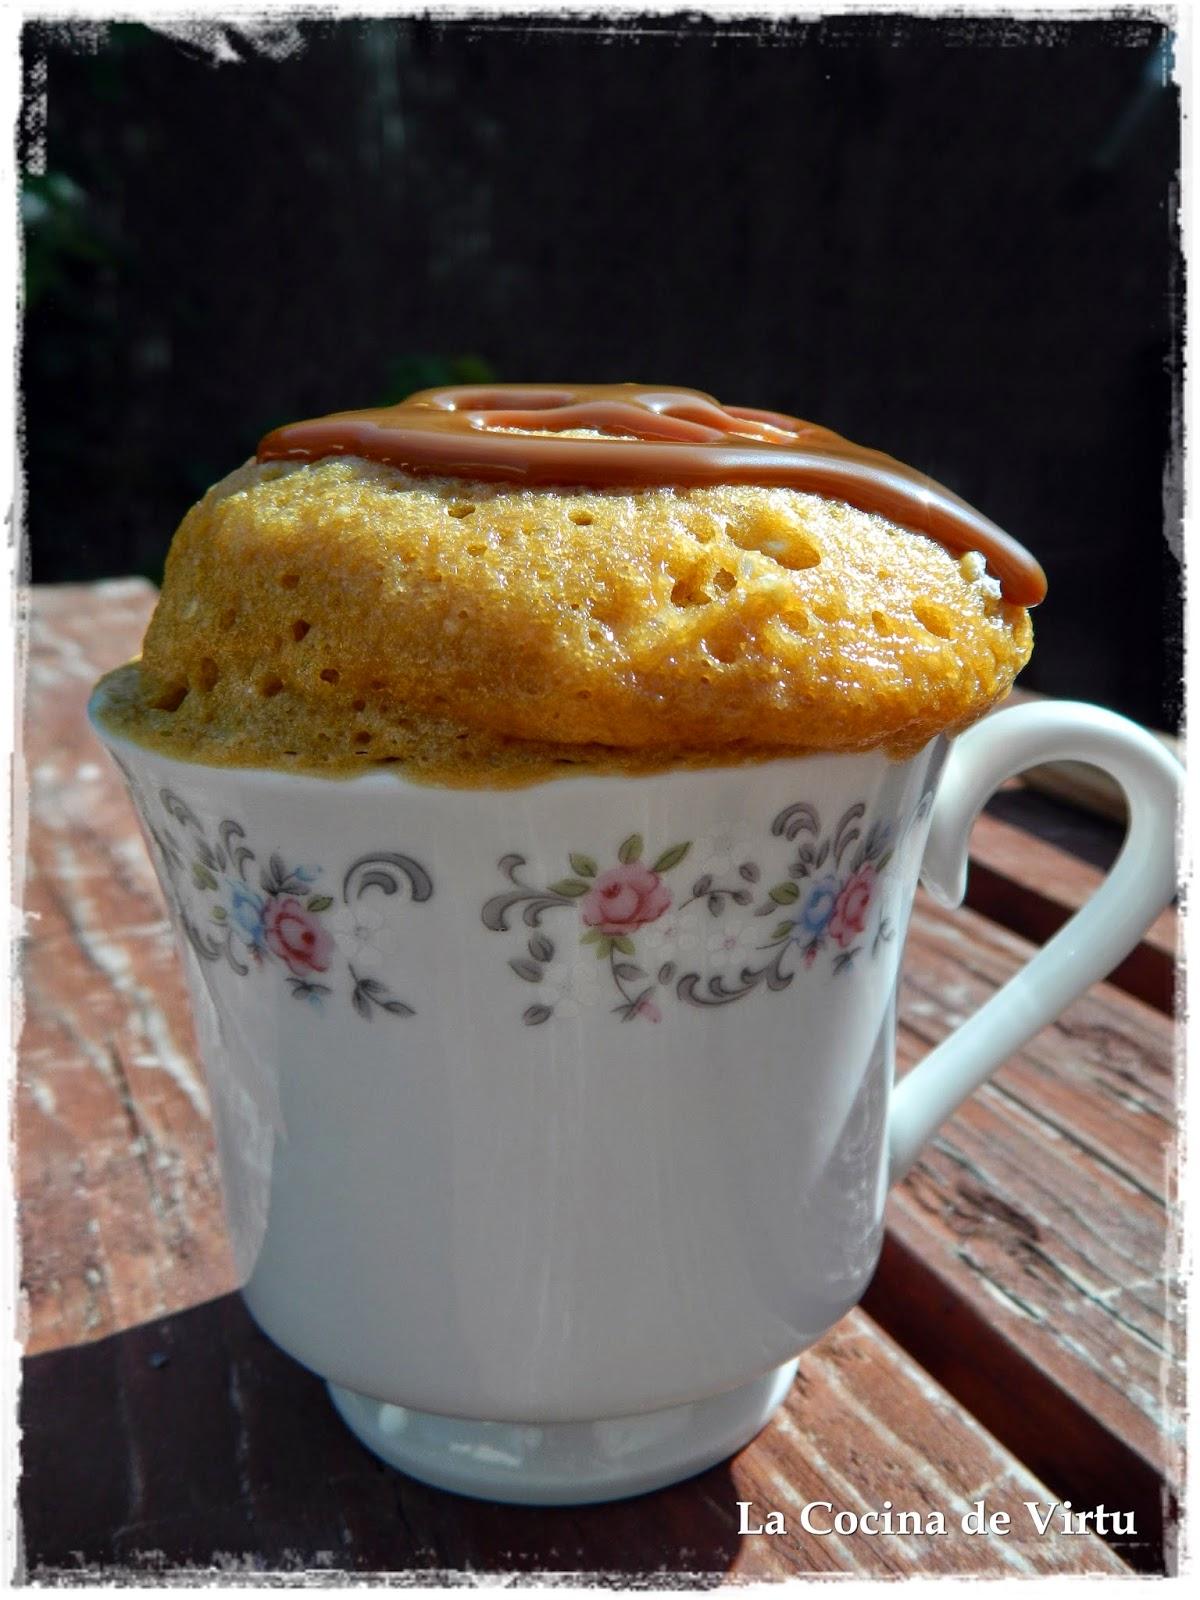 La cocina de virtu mug cake dulce de leche al microondas for Cocina al microondas